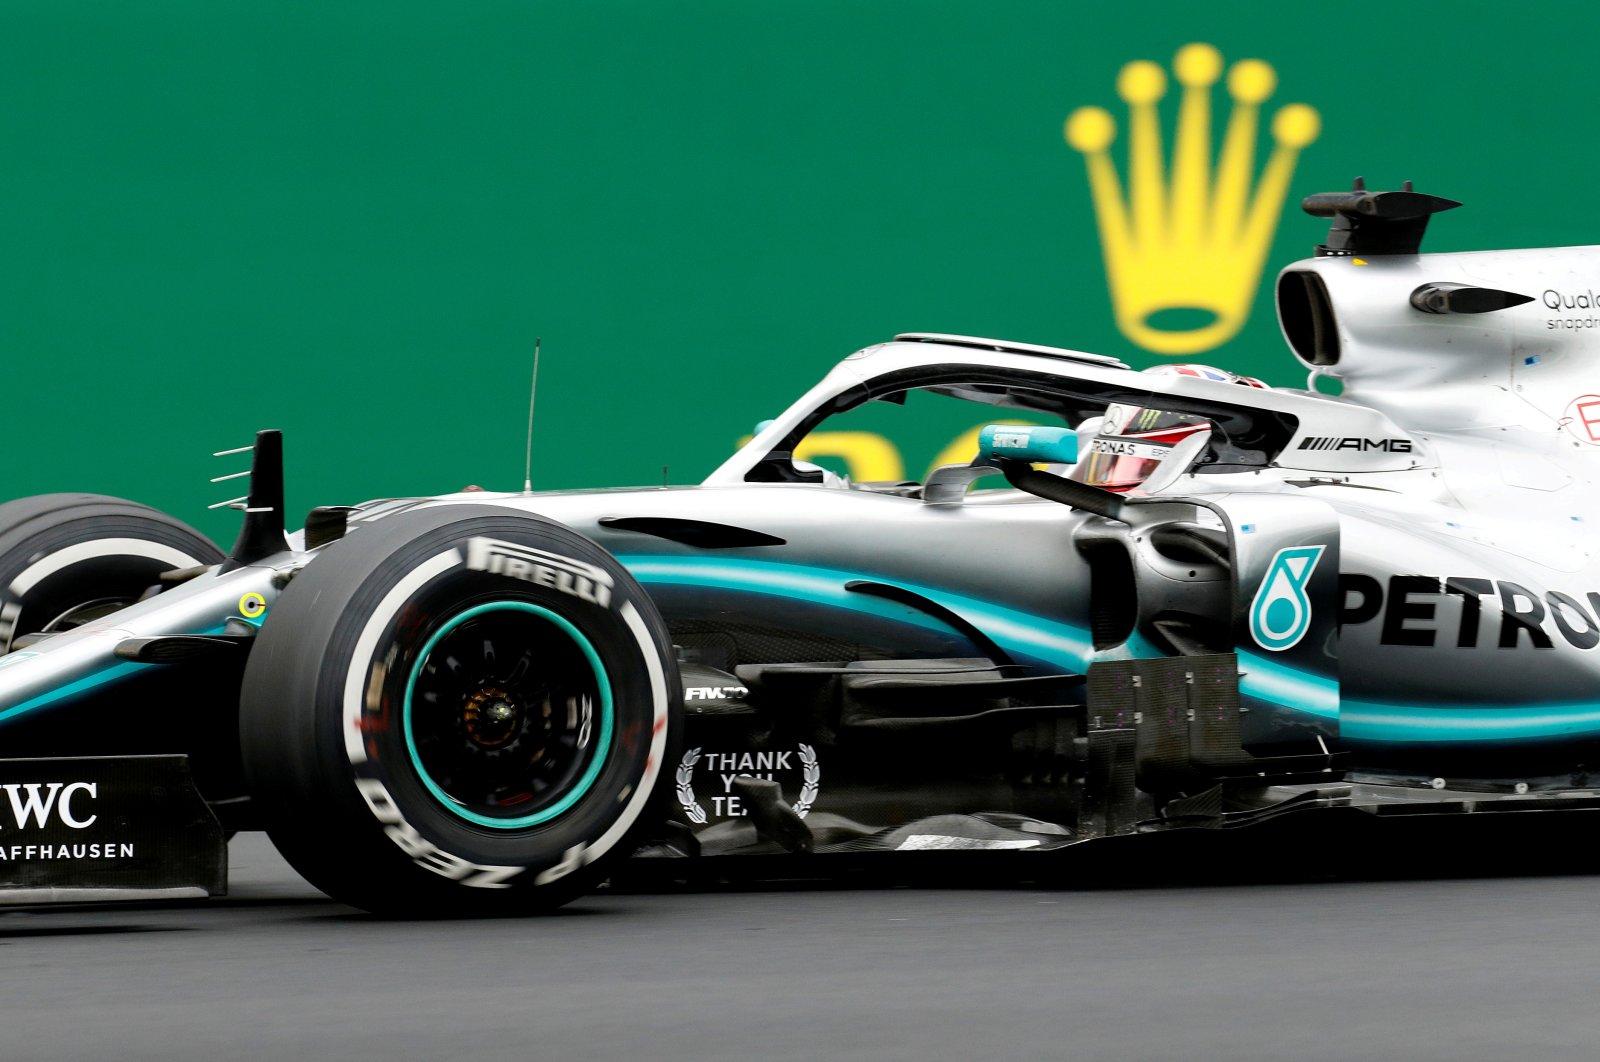 Mercedes driver Lewis Hamilton wins the F1 British Grand Prix, in Silverstone, Britain, July 14, 2019. (Reuters Photo)